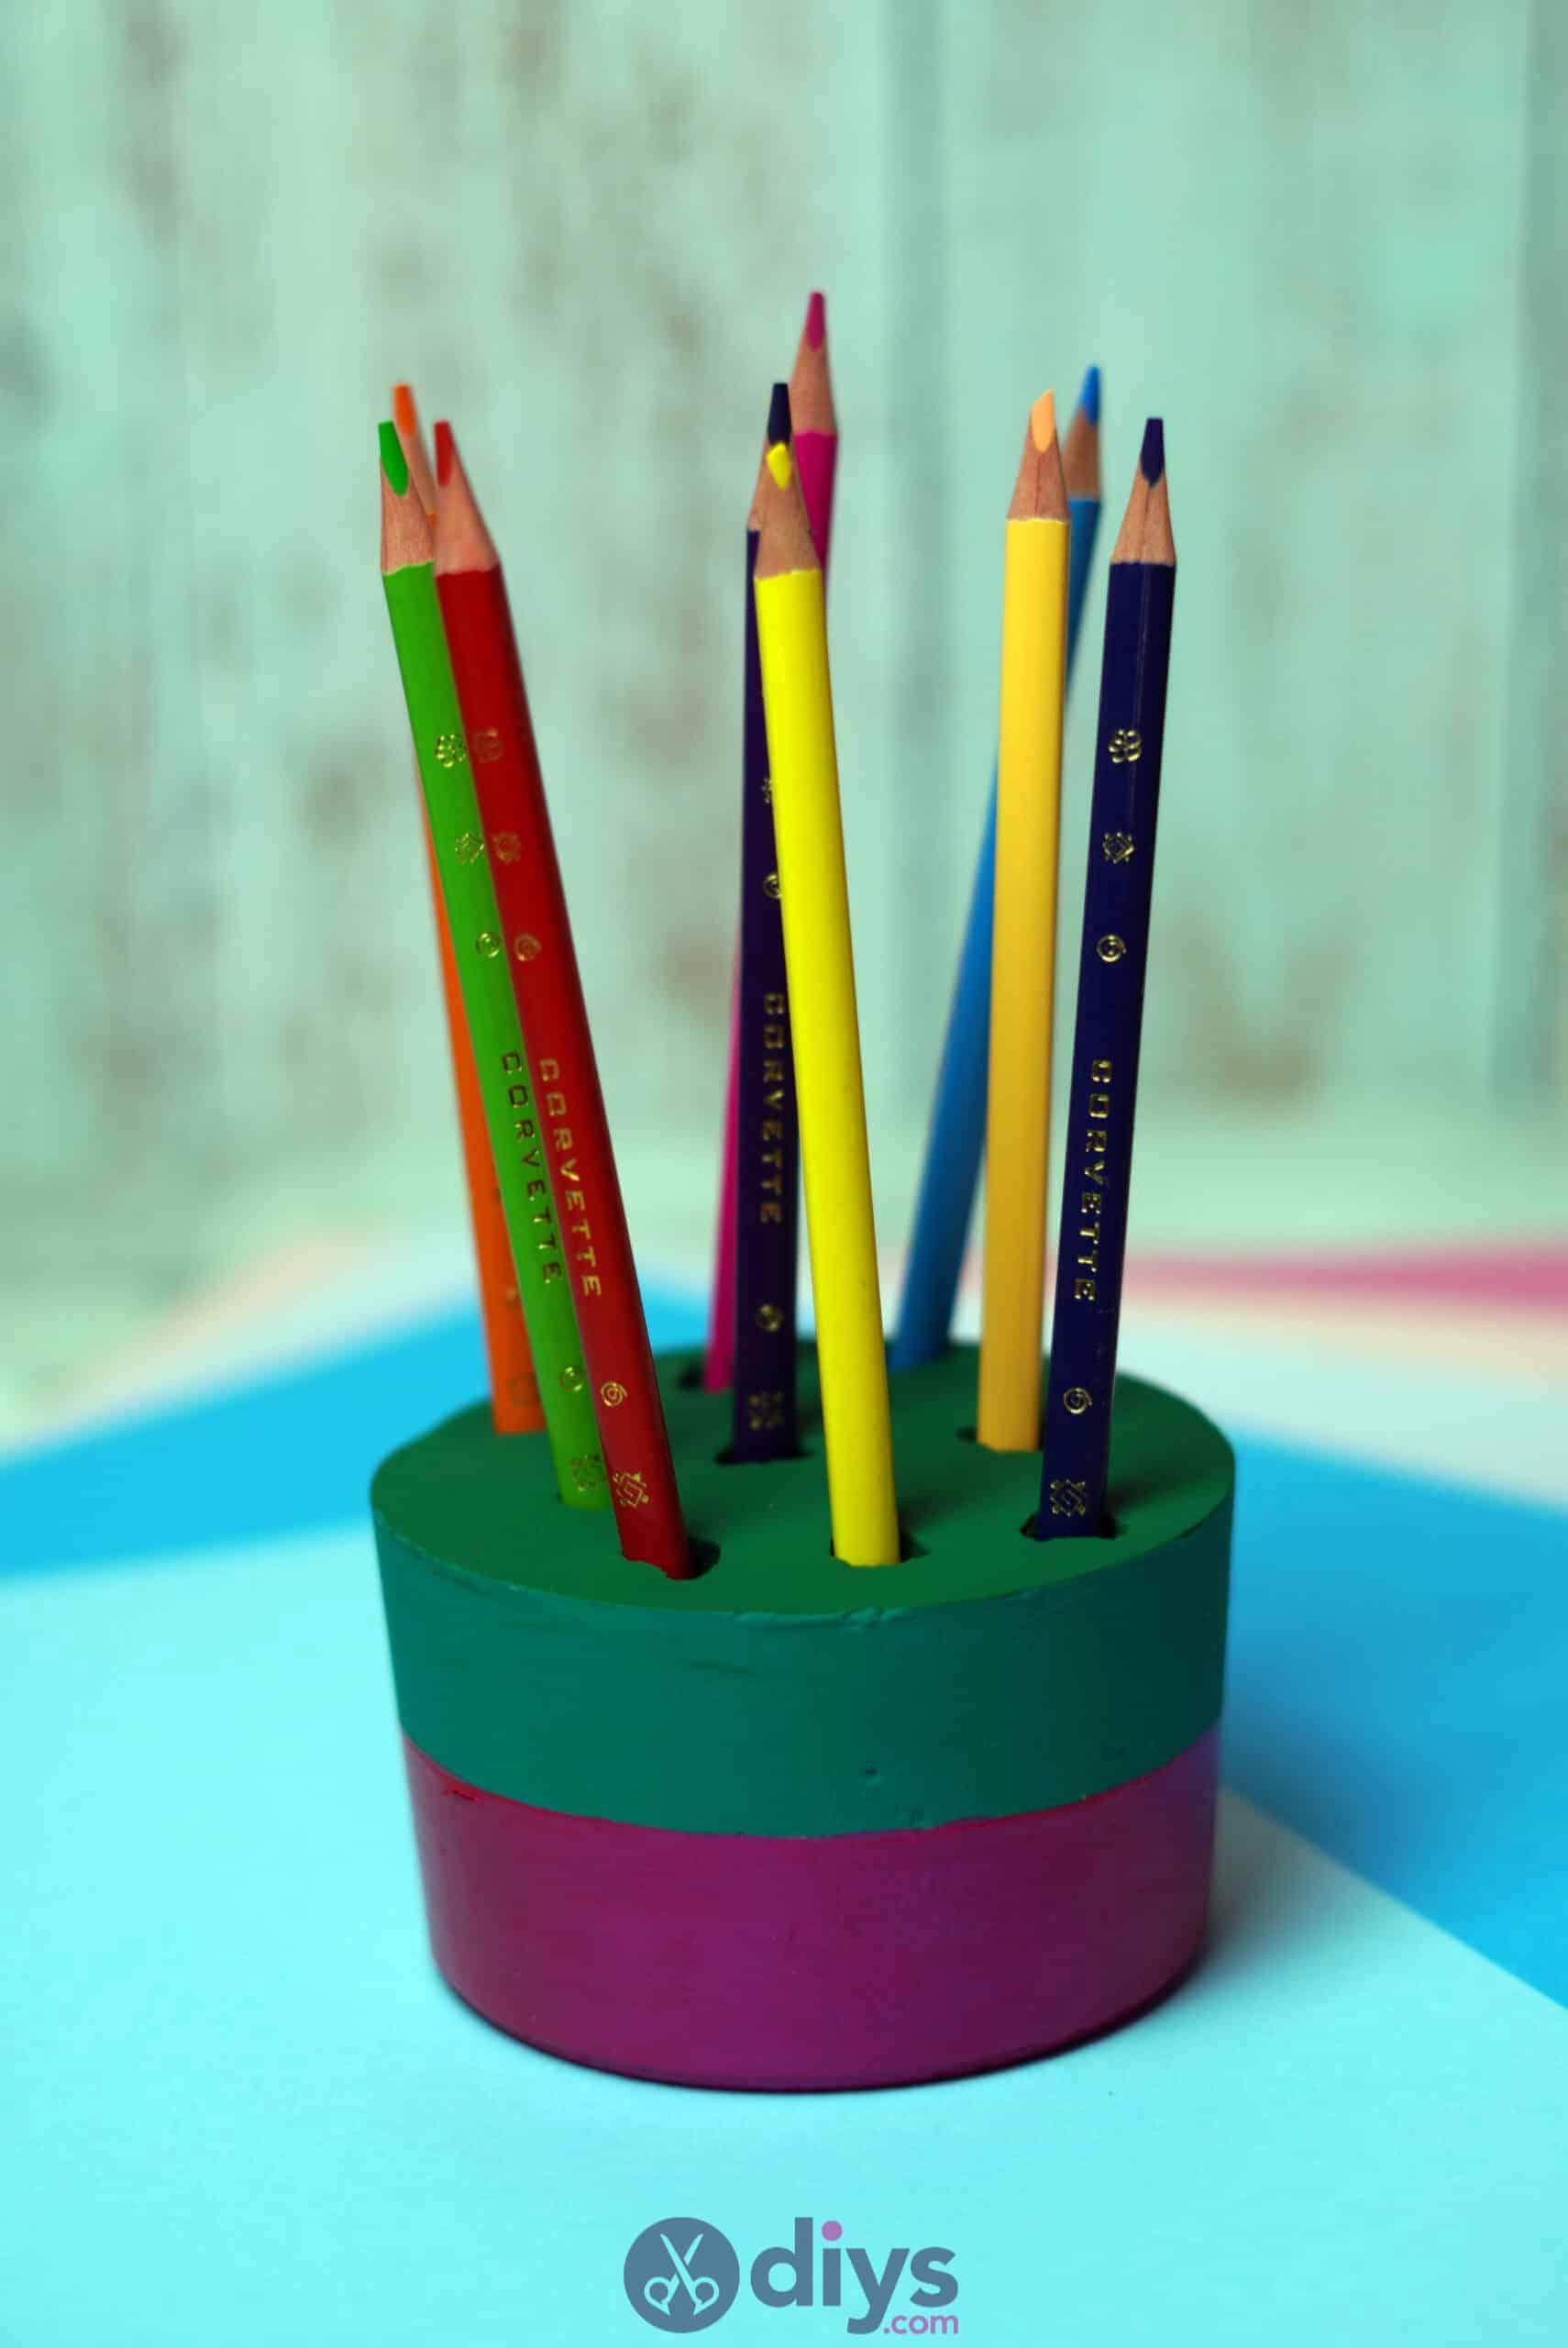 Diy concrete pencil holder simple craft